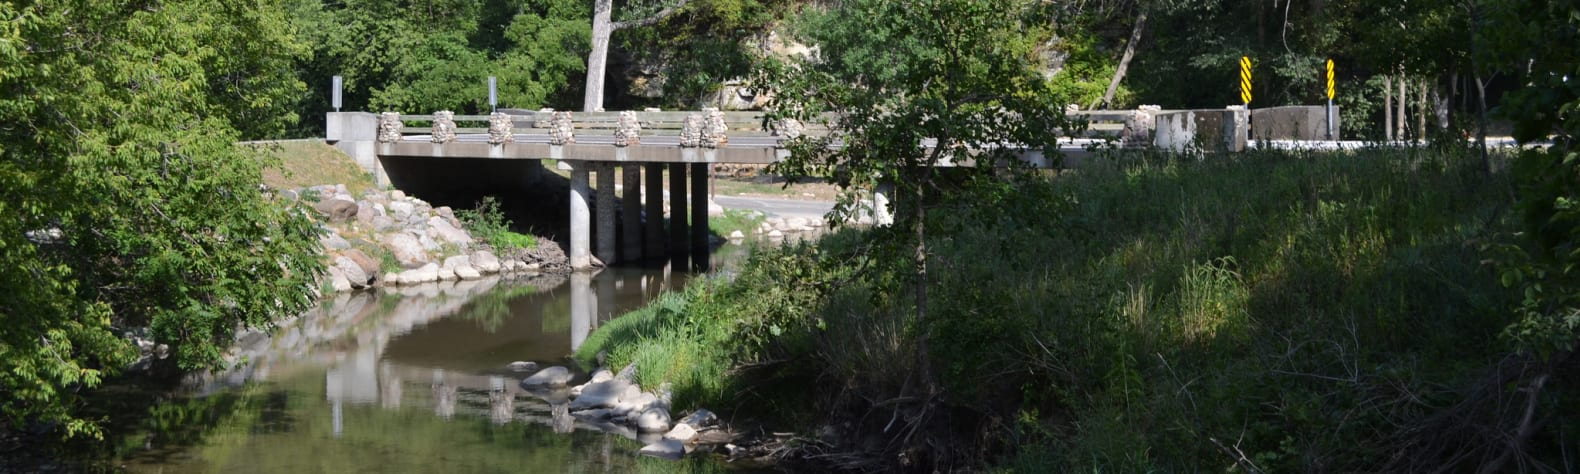 Dolliver Memorial State Park